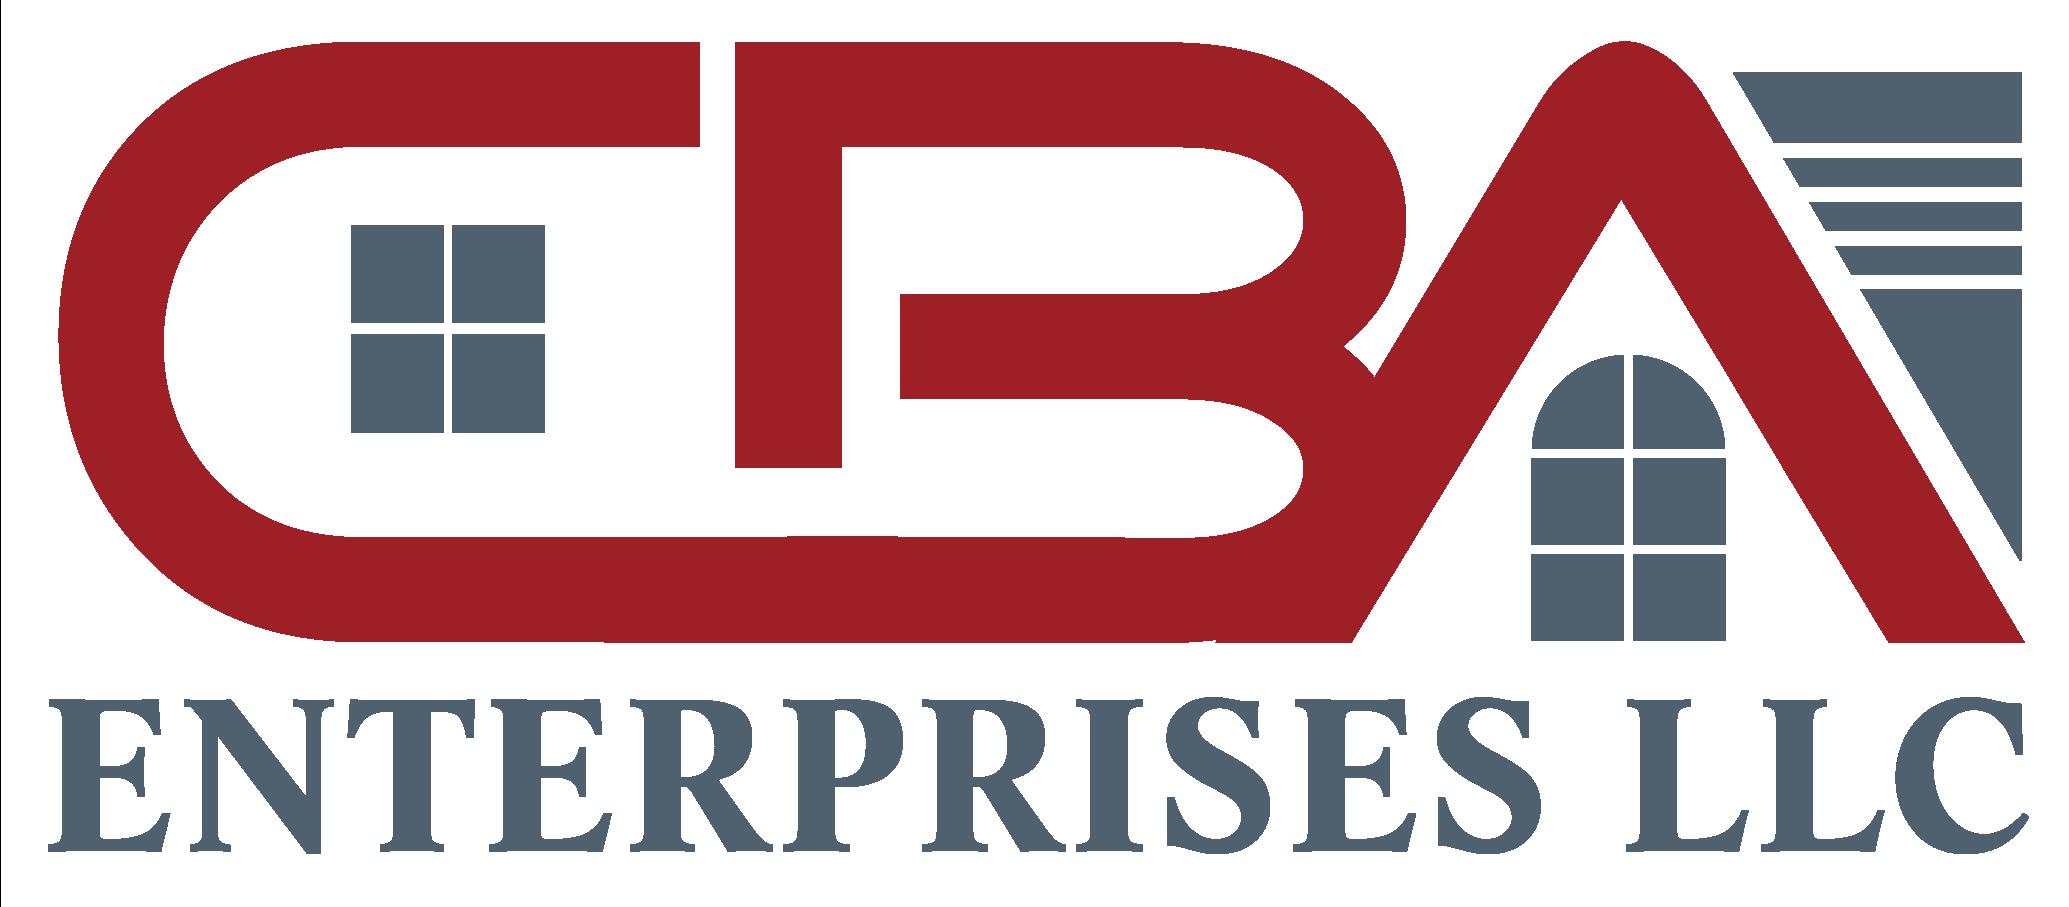 CBA Enterprises, LLC